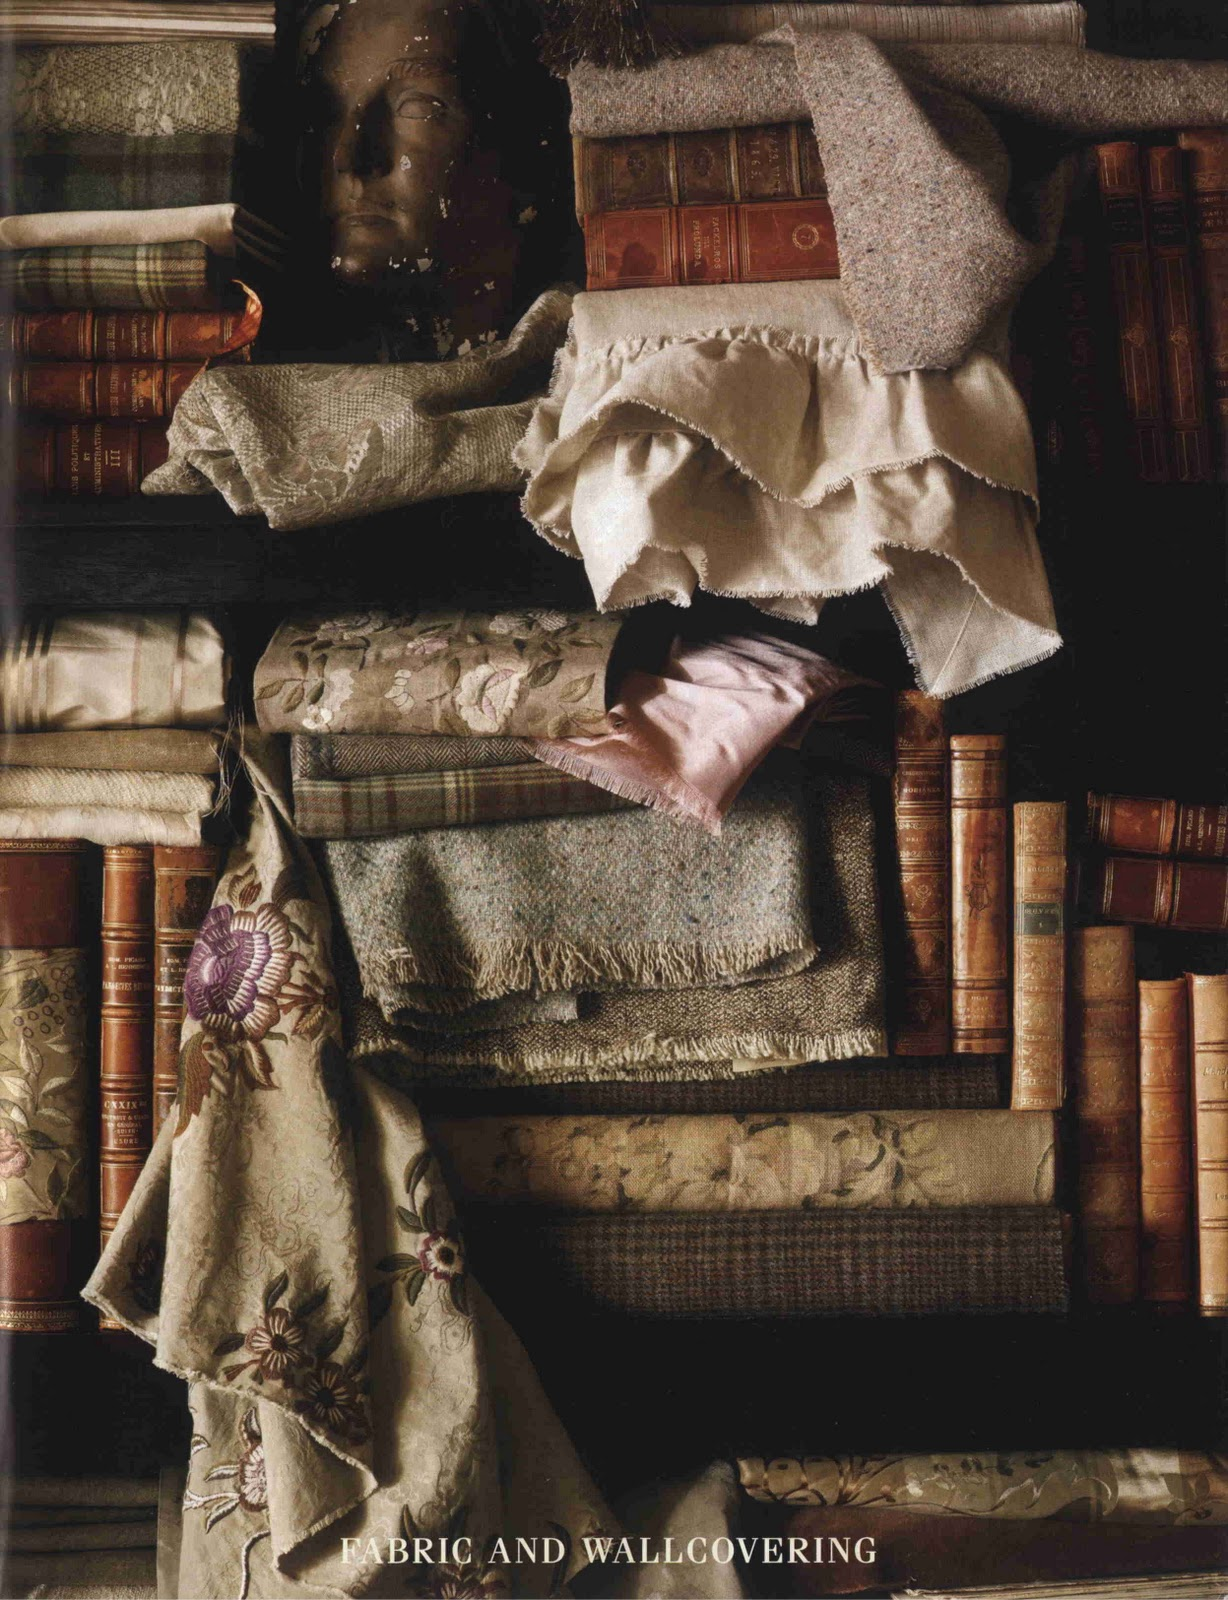 http://1.bp.blogspot.com/-aqgYZObhhKU/Tc5wY7Cz4lI/AAAAAAAAAgU/6OtIsx4ID0o/s1600/Menswear+-+Ralph-Lauren-fabric-wallcovering.jpg